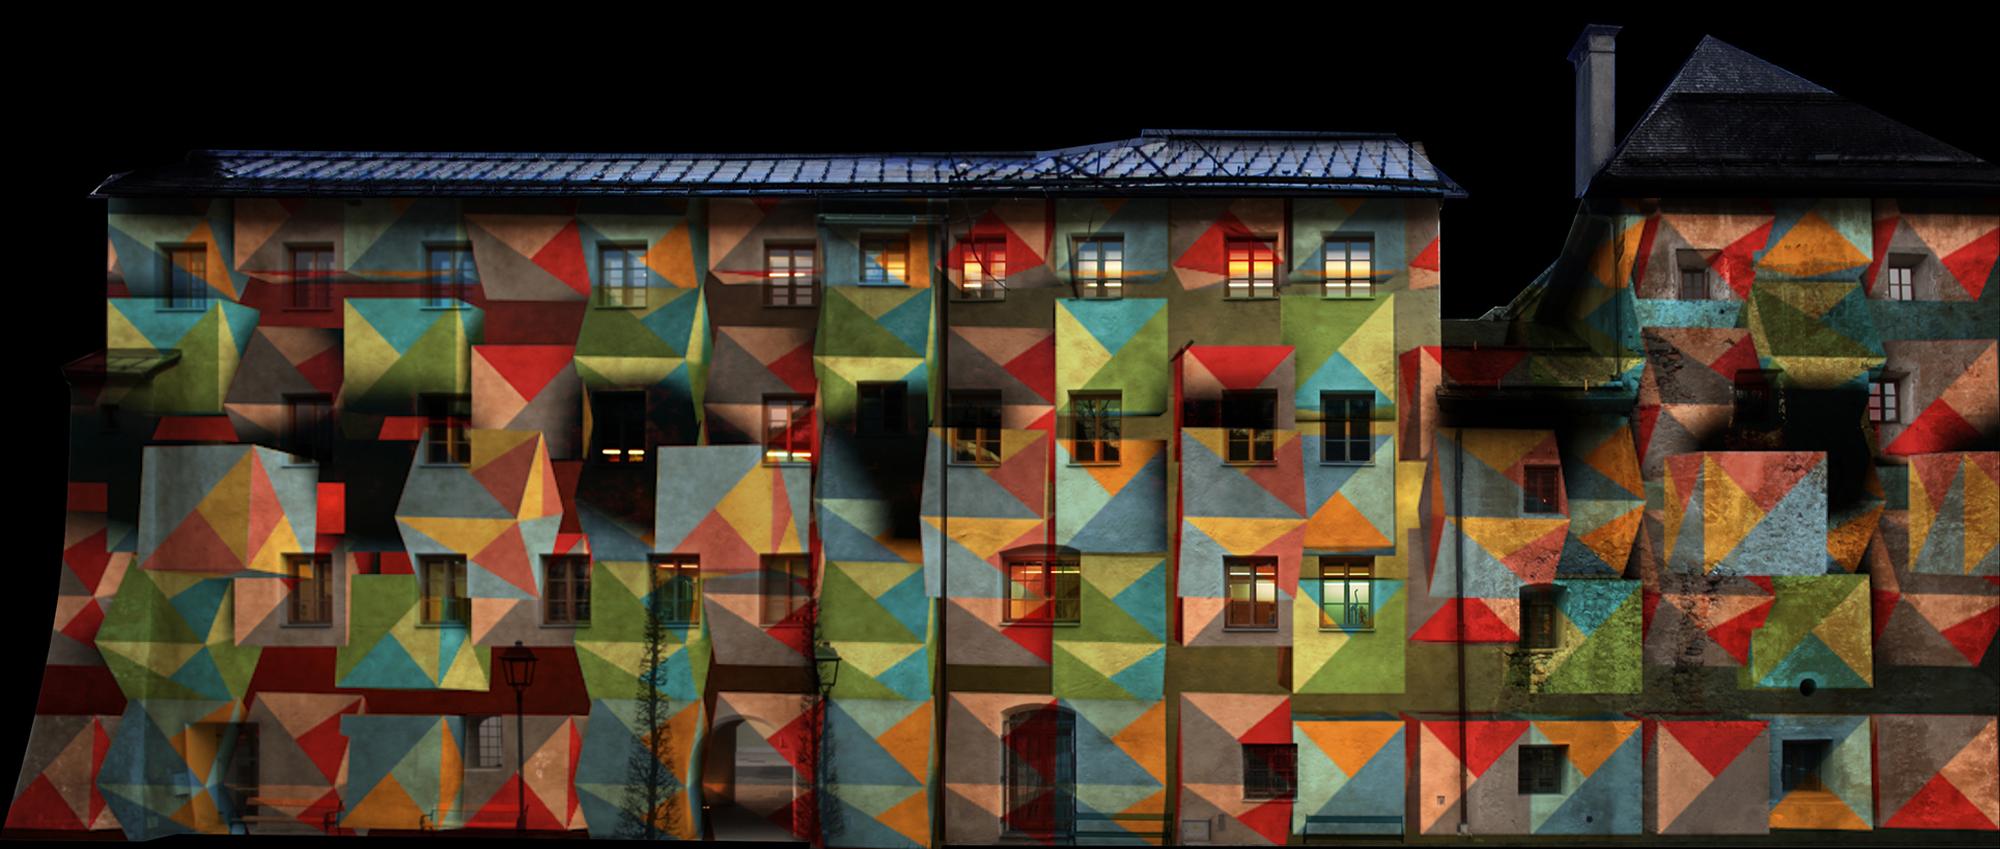 11-Making-Of-Kitzbühel